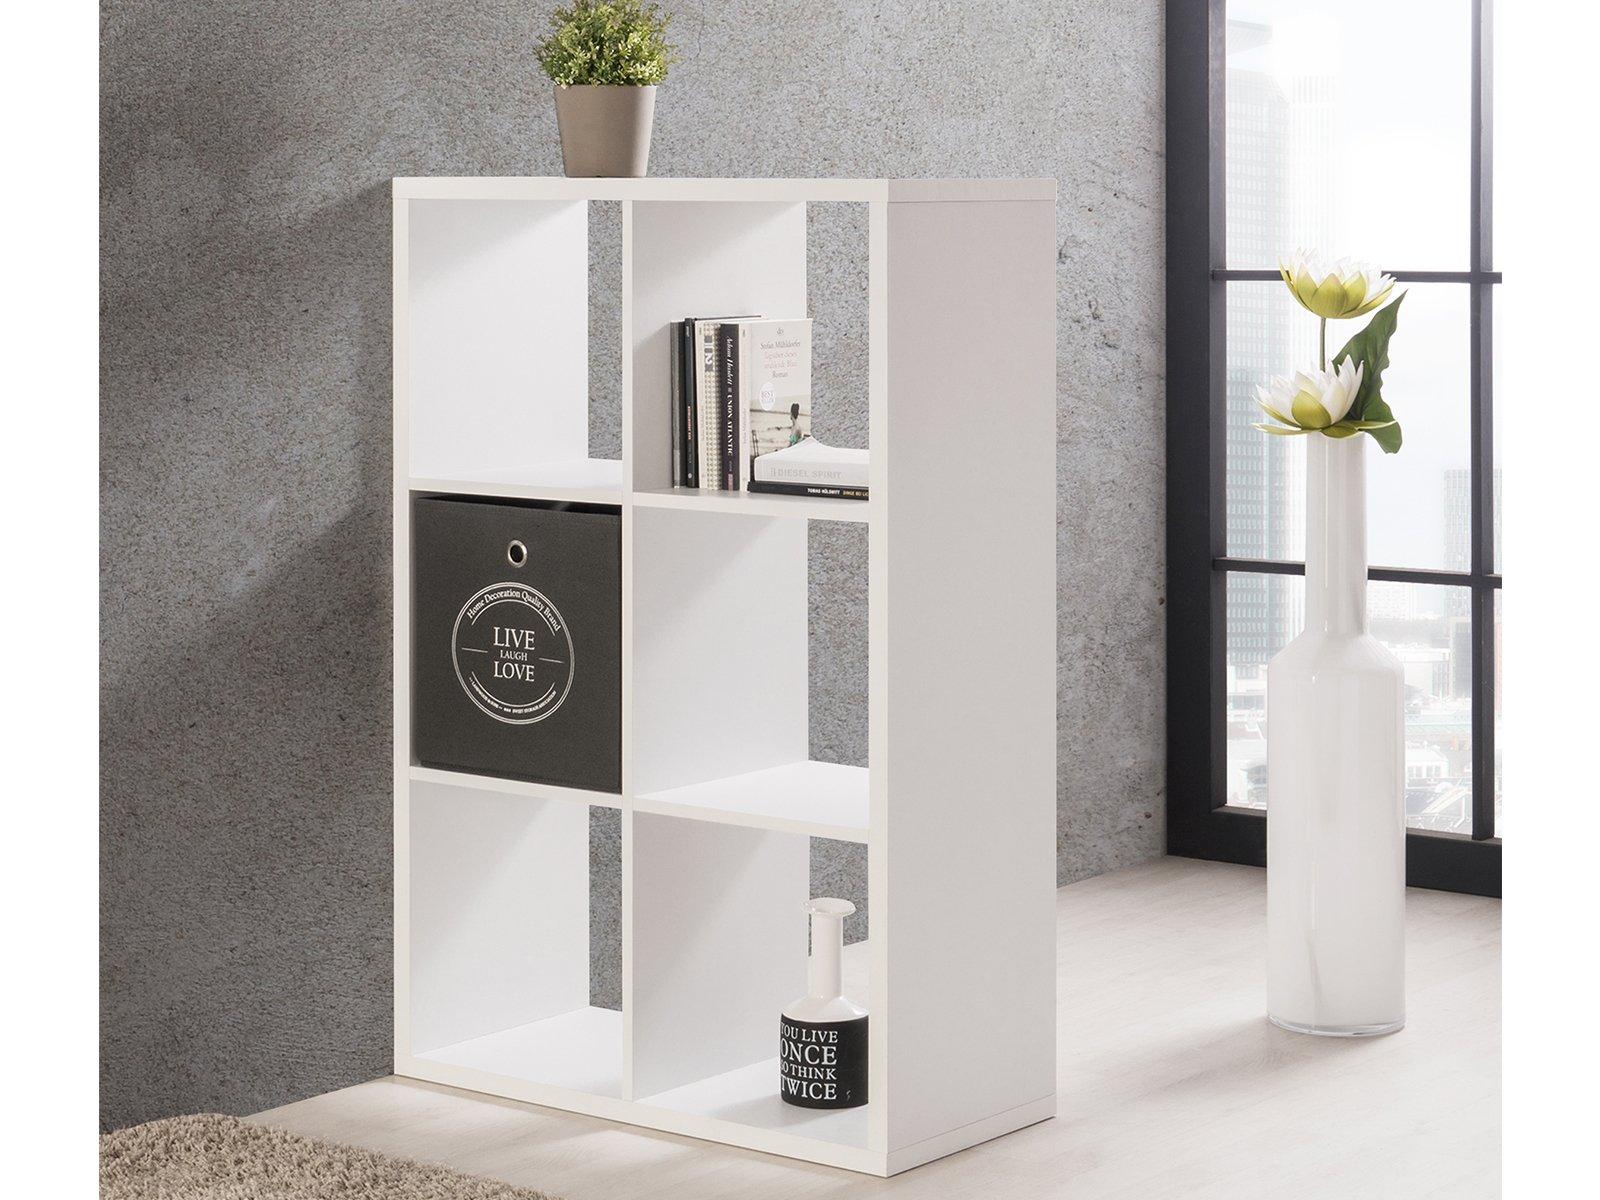 schrank als raumteiler ruckwand verkleiden. Black Bedroom Furniture Sets. Home Design Ideas